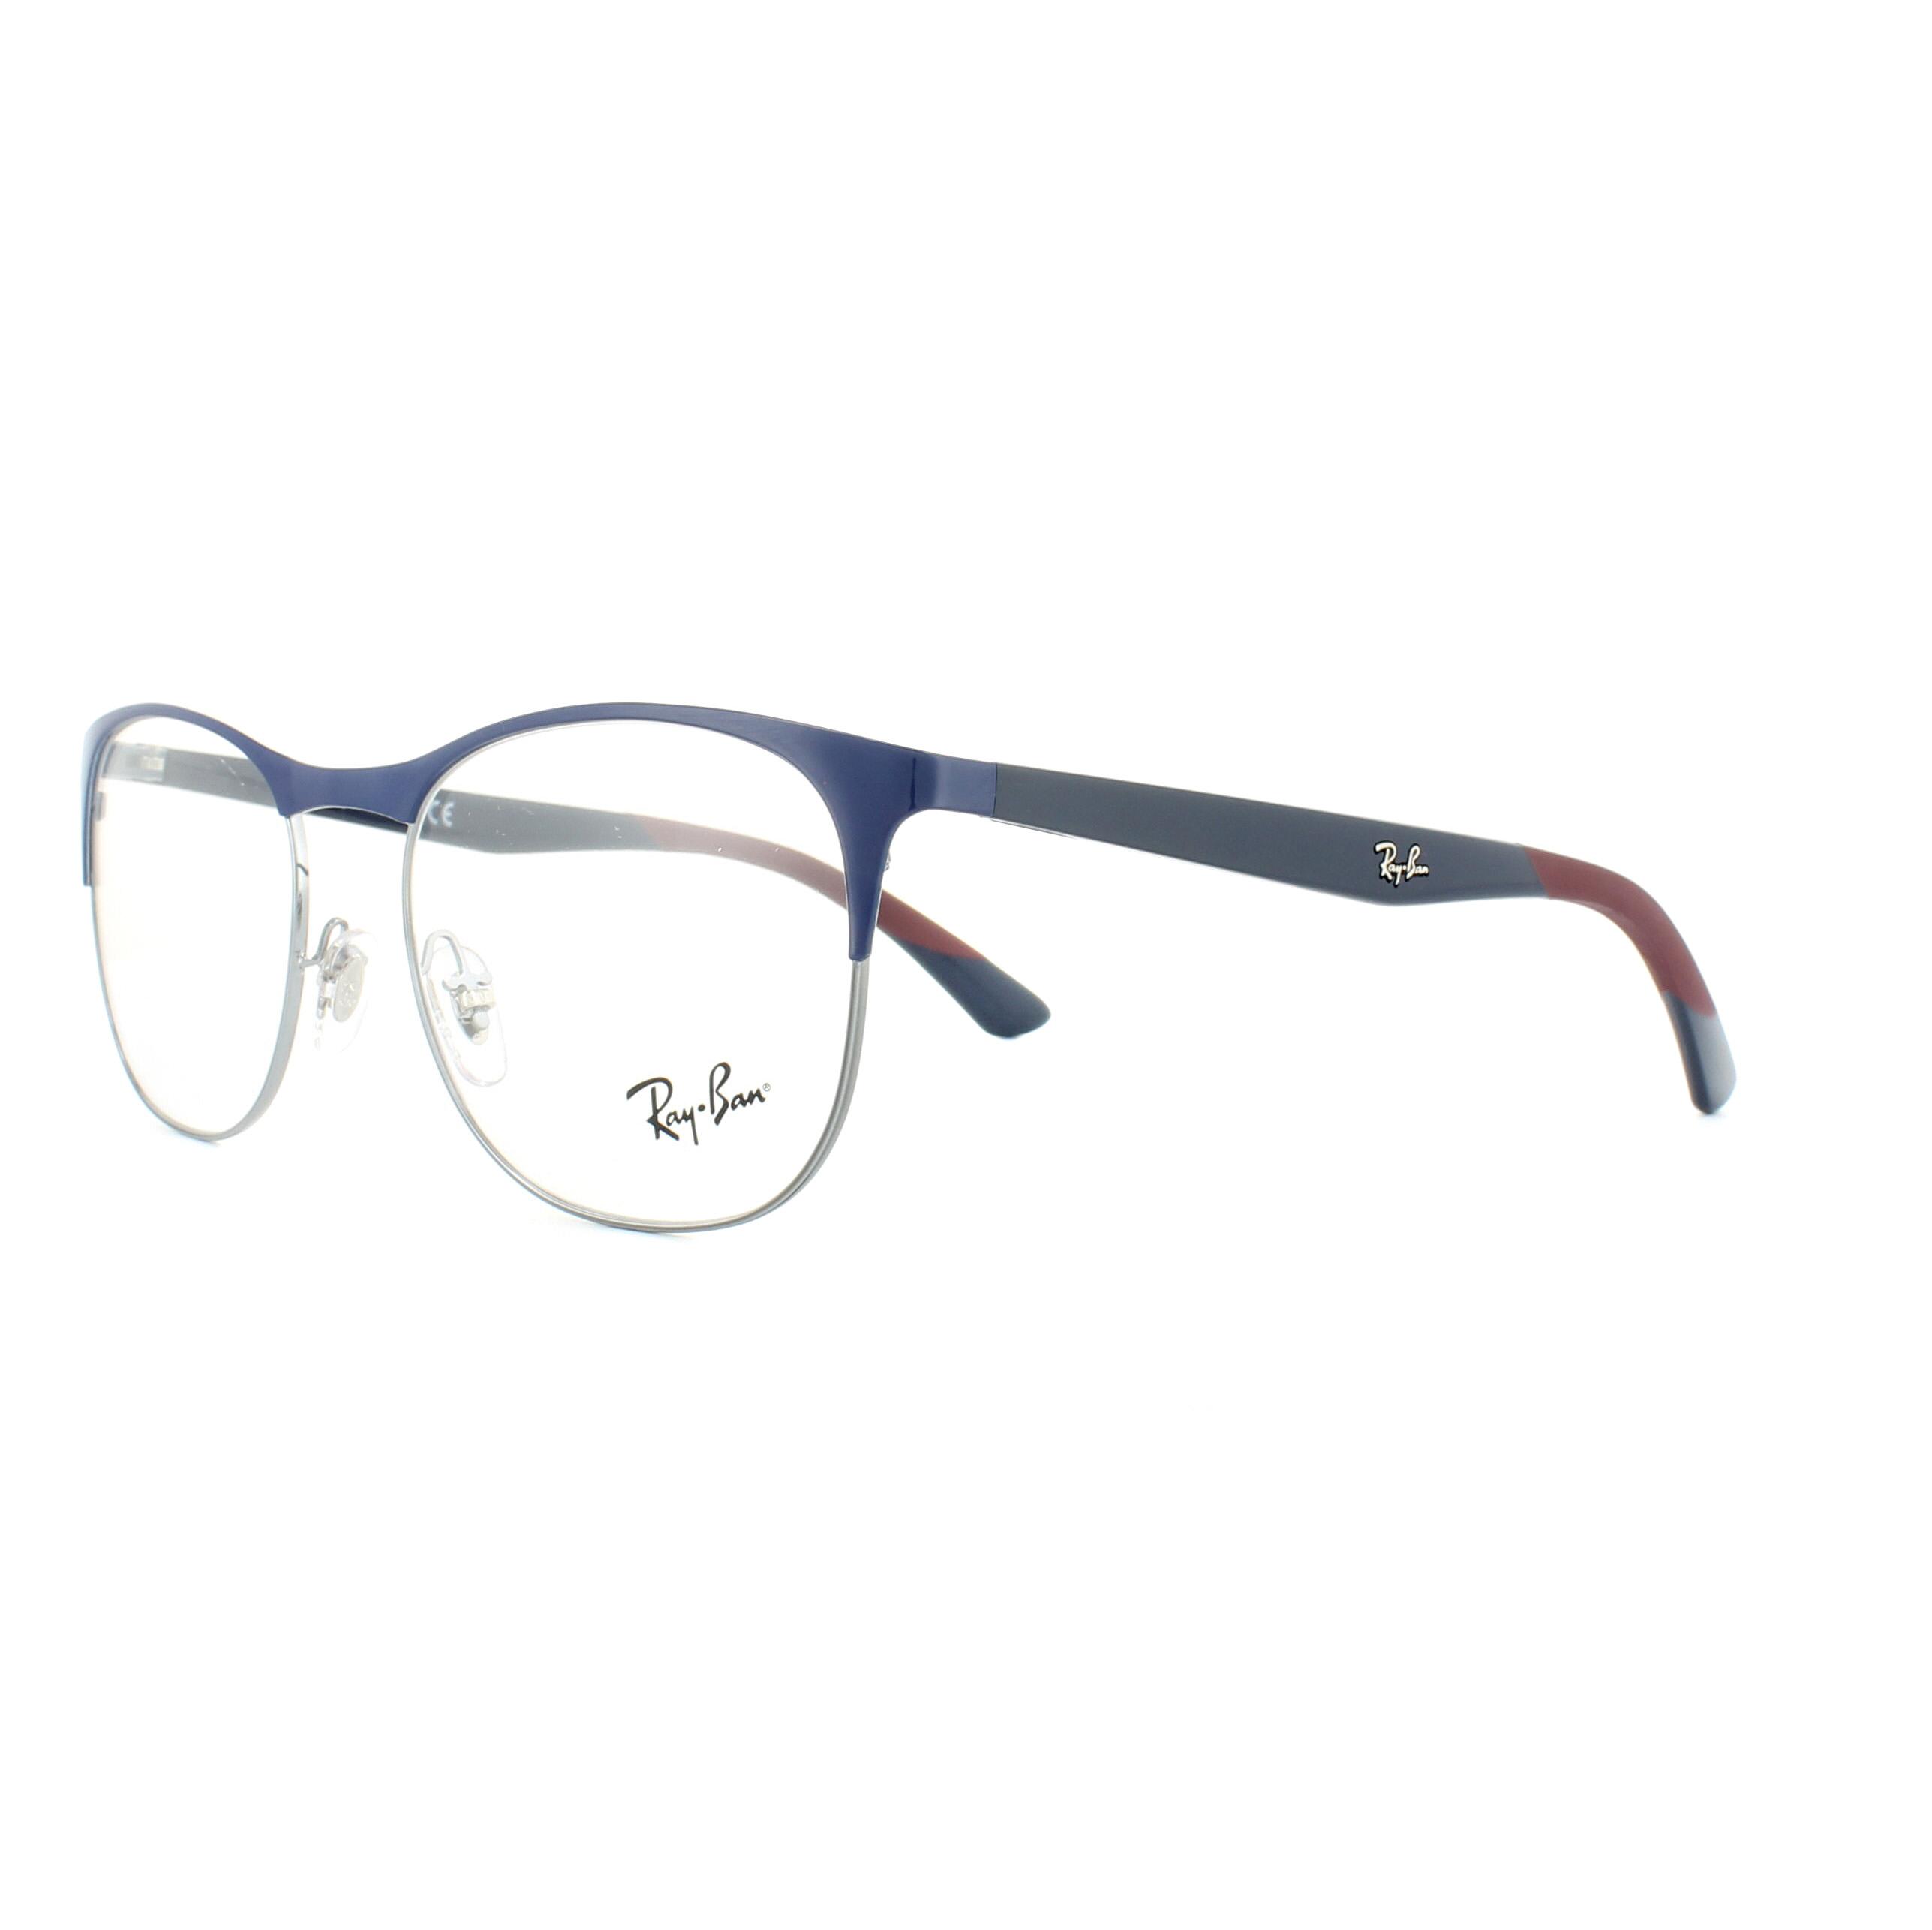 Details About Ray Ban Glasses Frames 6412 2967 Gunmetal Blue 50mm Mens